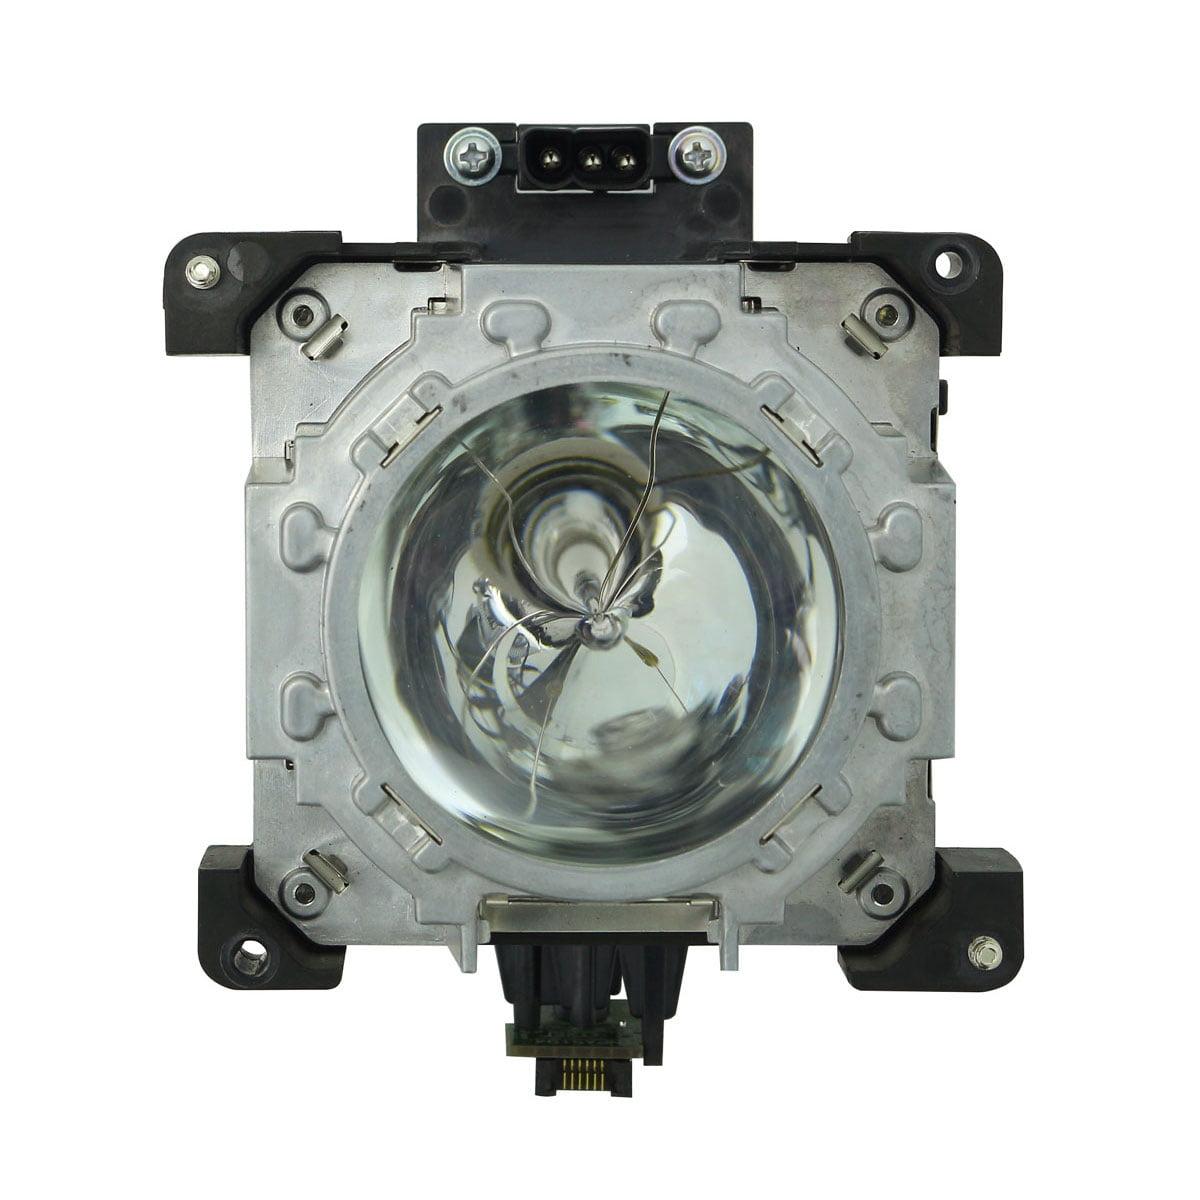 Original Ushio Projector Lamp Replacement for Panasonic PT-DW17K (Bulb Only) - image 4 de 5